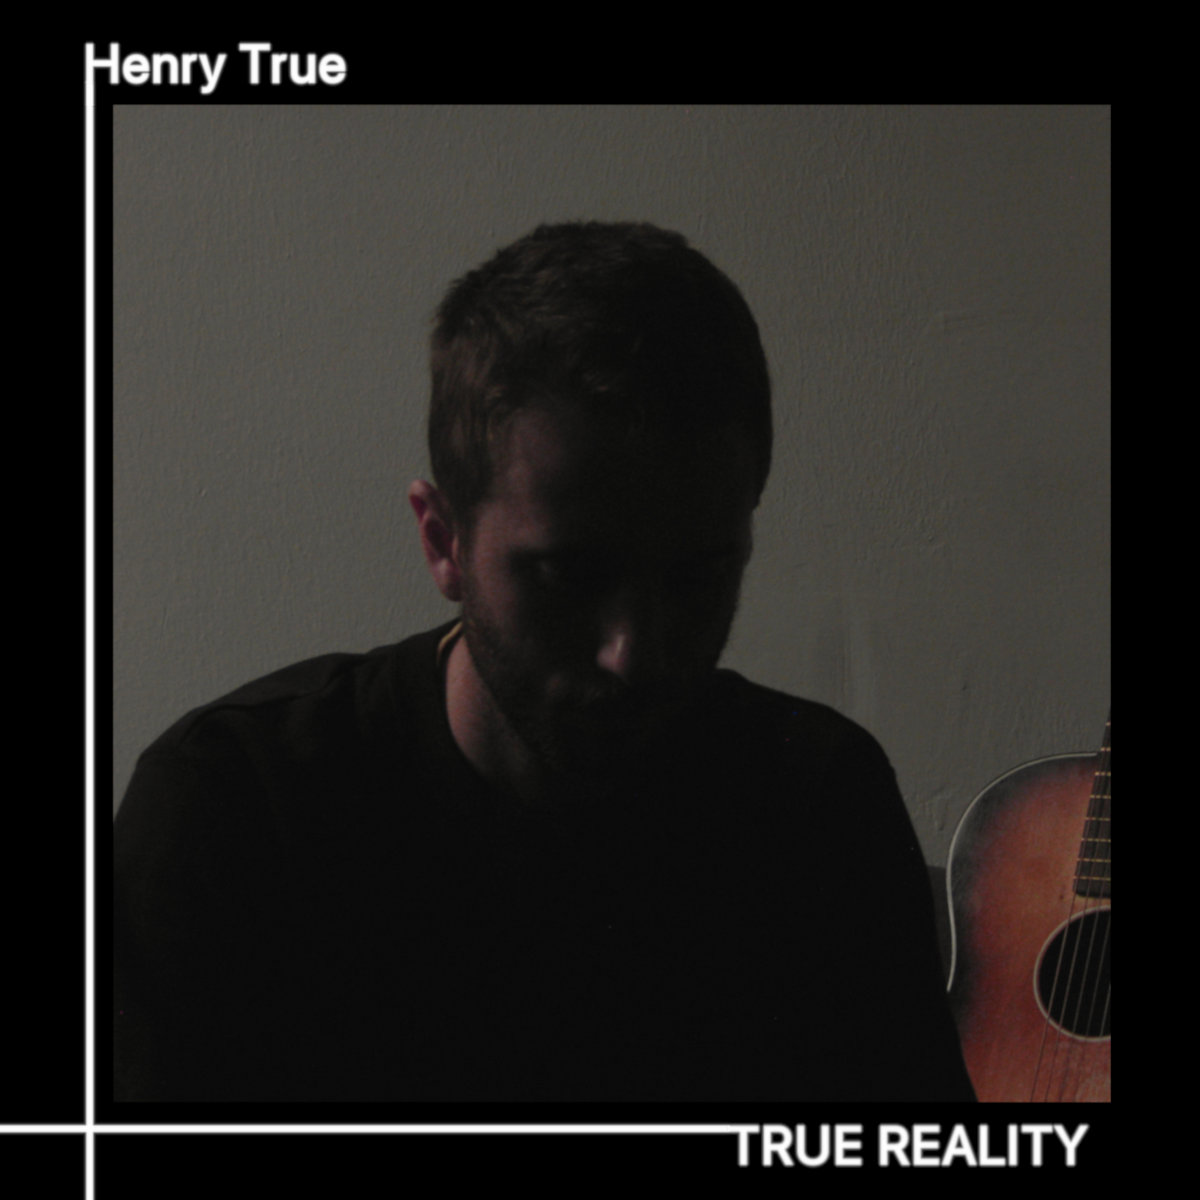 True Reality artwork